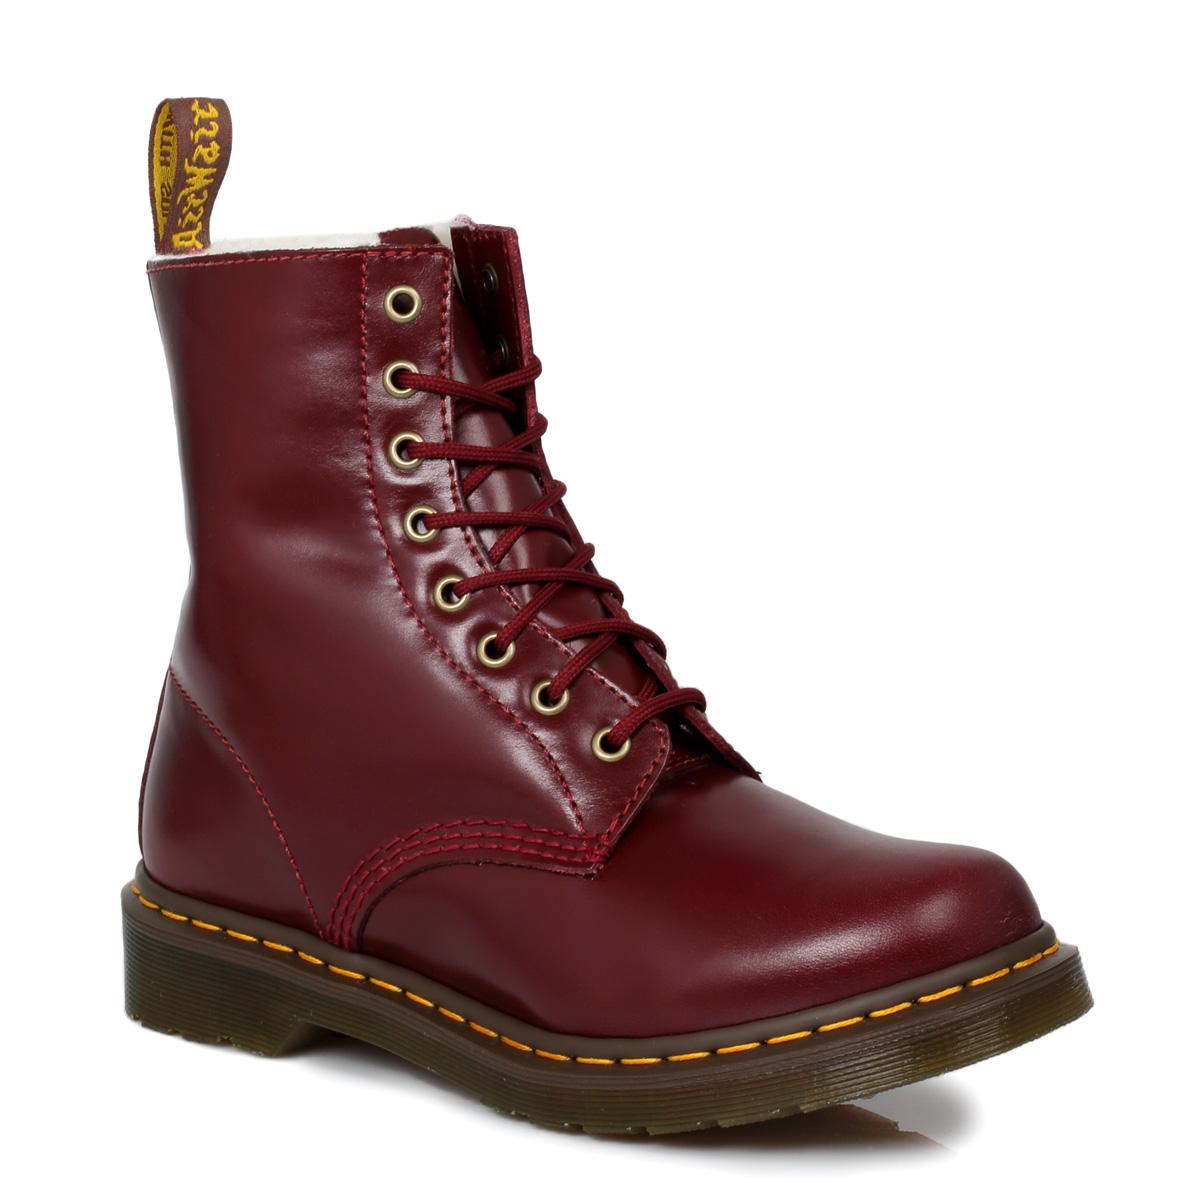 dr martens ankle boots serena womens docs leather lace up. Black Bedroom Furniture Sets. Home Design Ideas